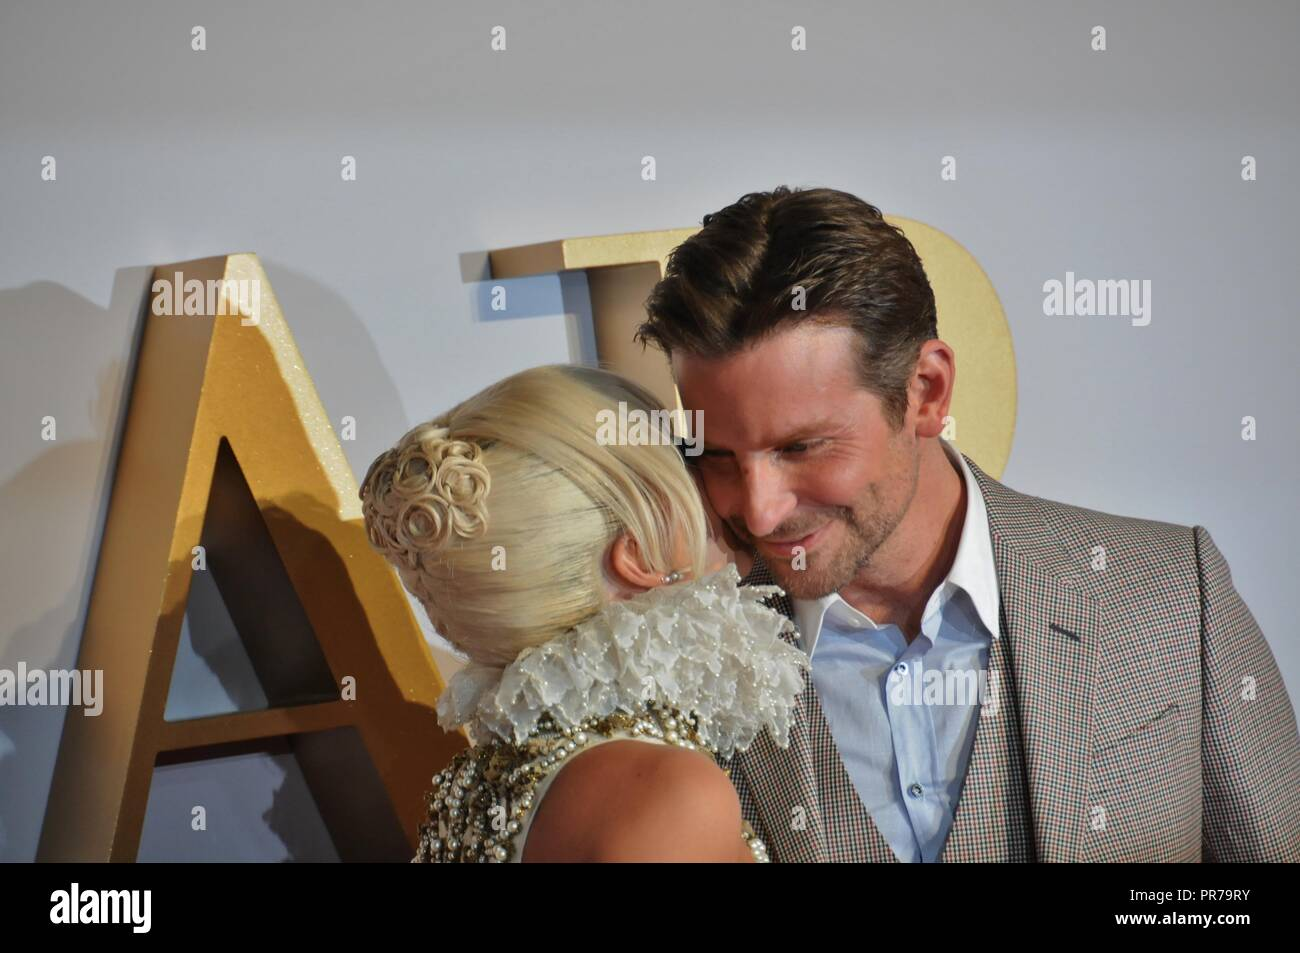 Lady Gaga baci Bradley Cooper, al London film premier di è nata una stella. Foto Stock